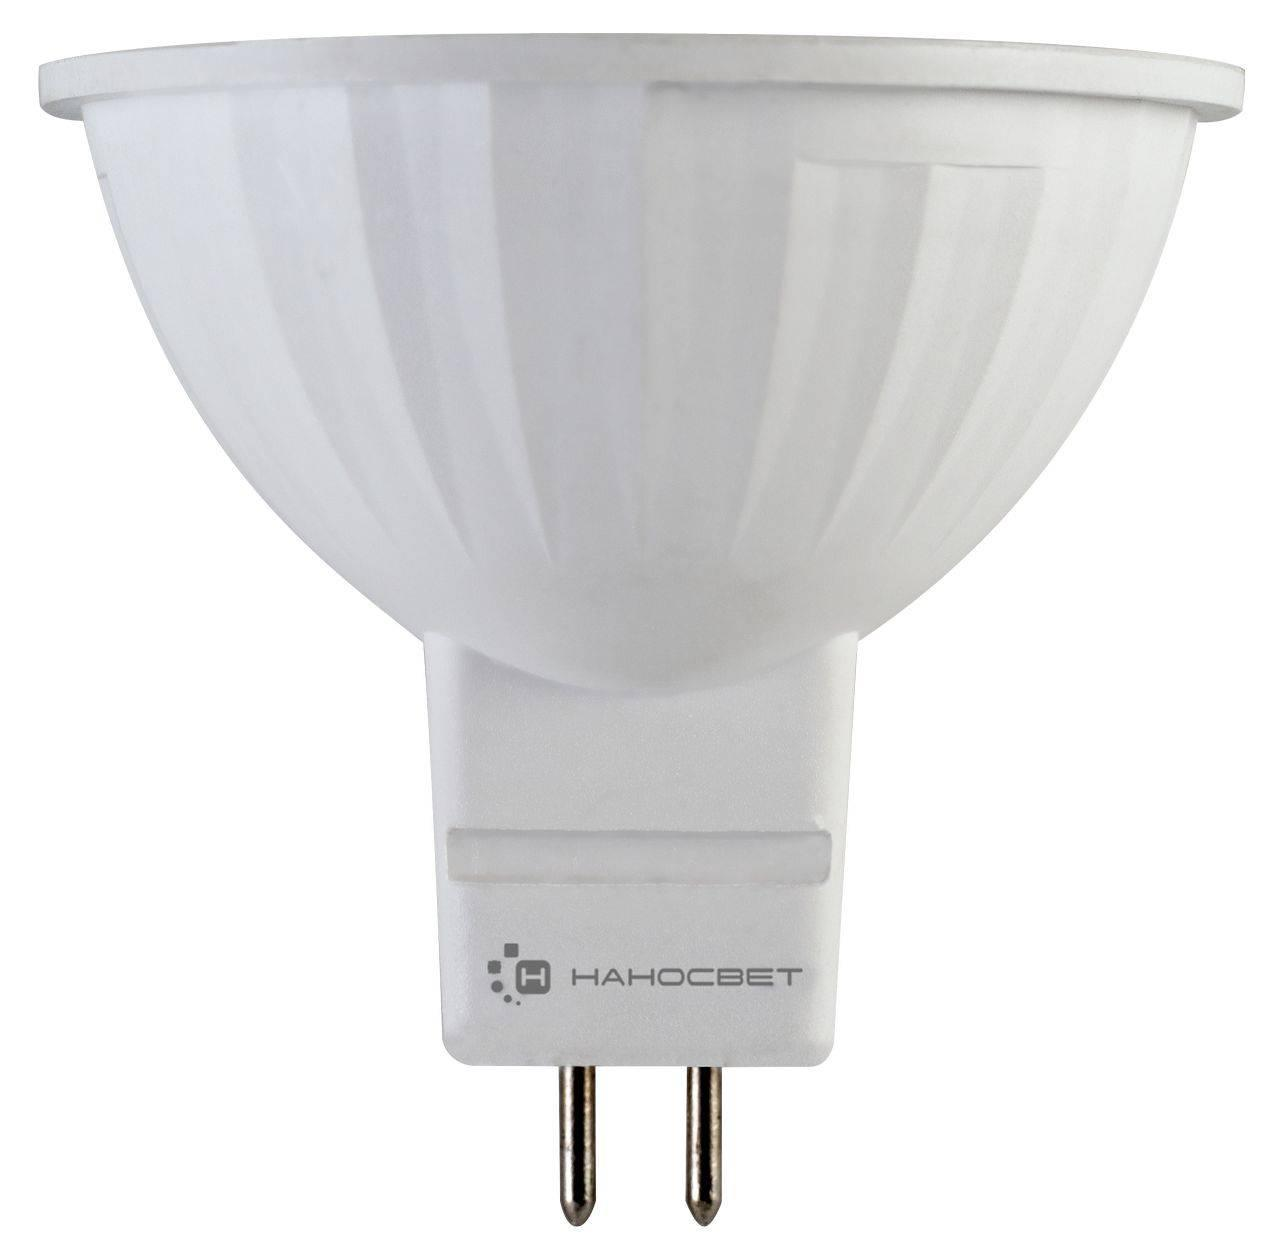 Лампа светодиодная GU5.3 6W 4000K матовая LE-MR16A-6/GU5.3/840 L195 колесные диски slik l195 6 5x16 4x98 d58 6 et33 mb